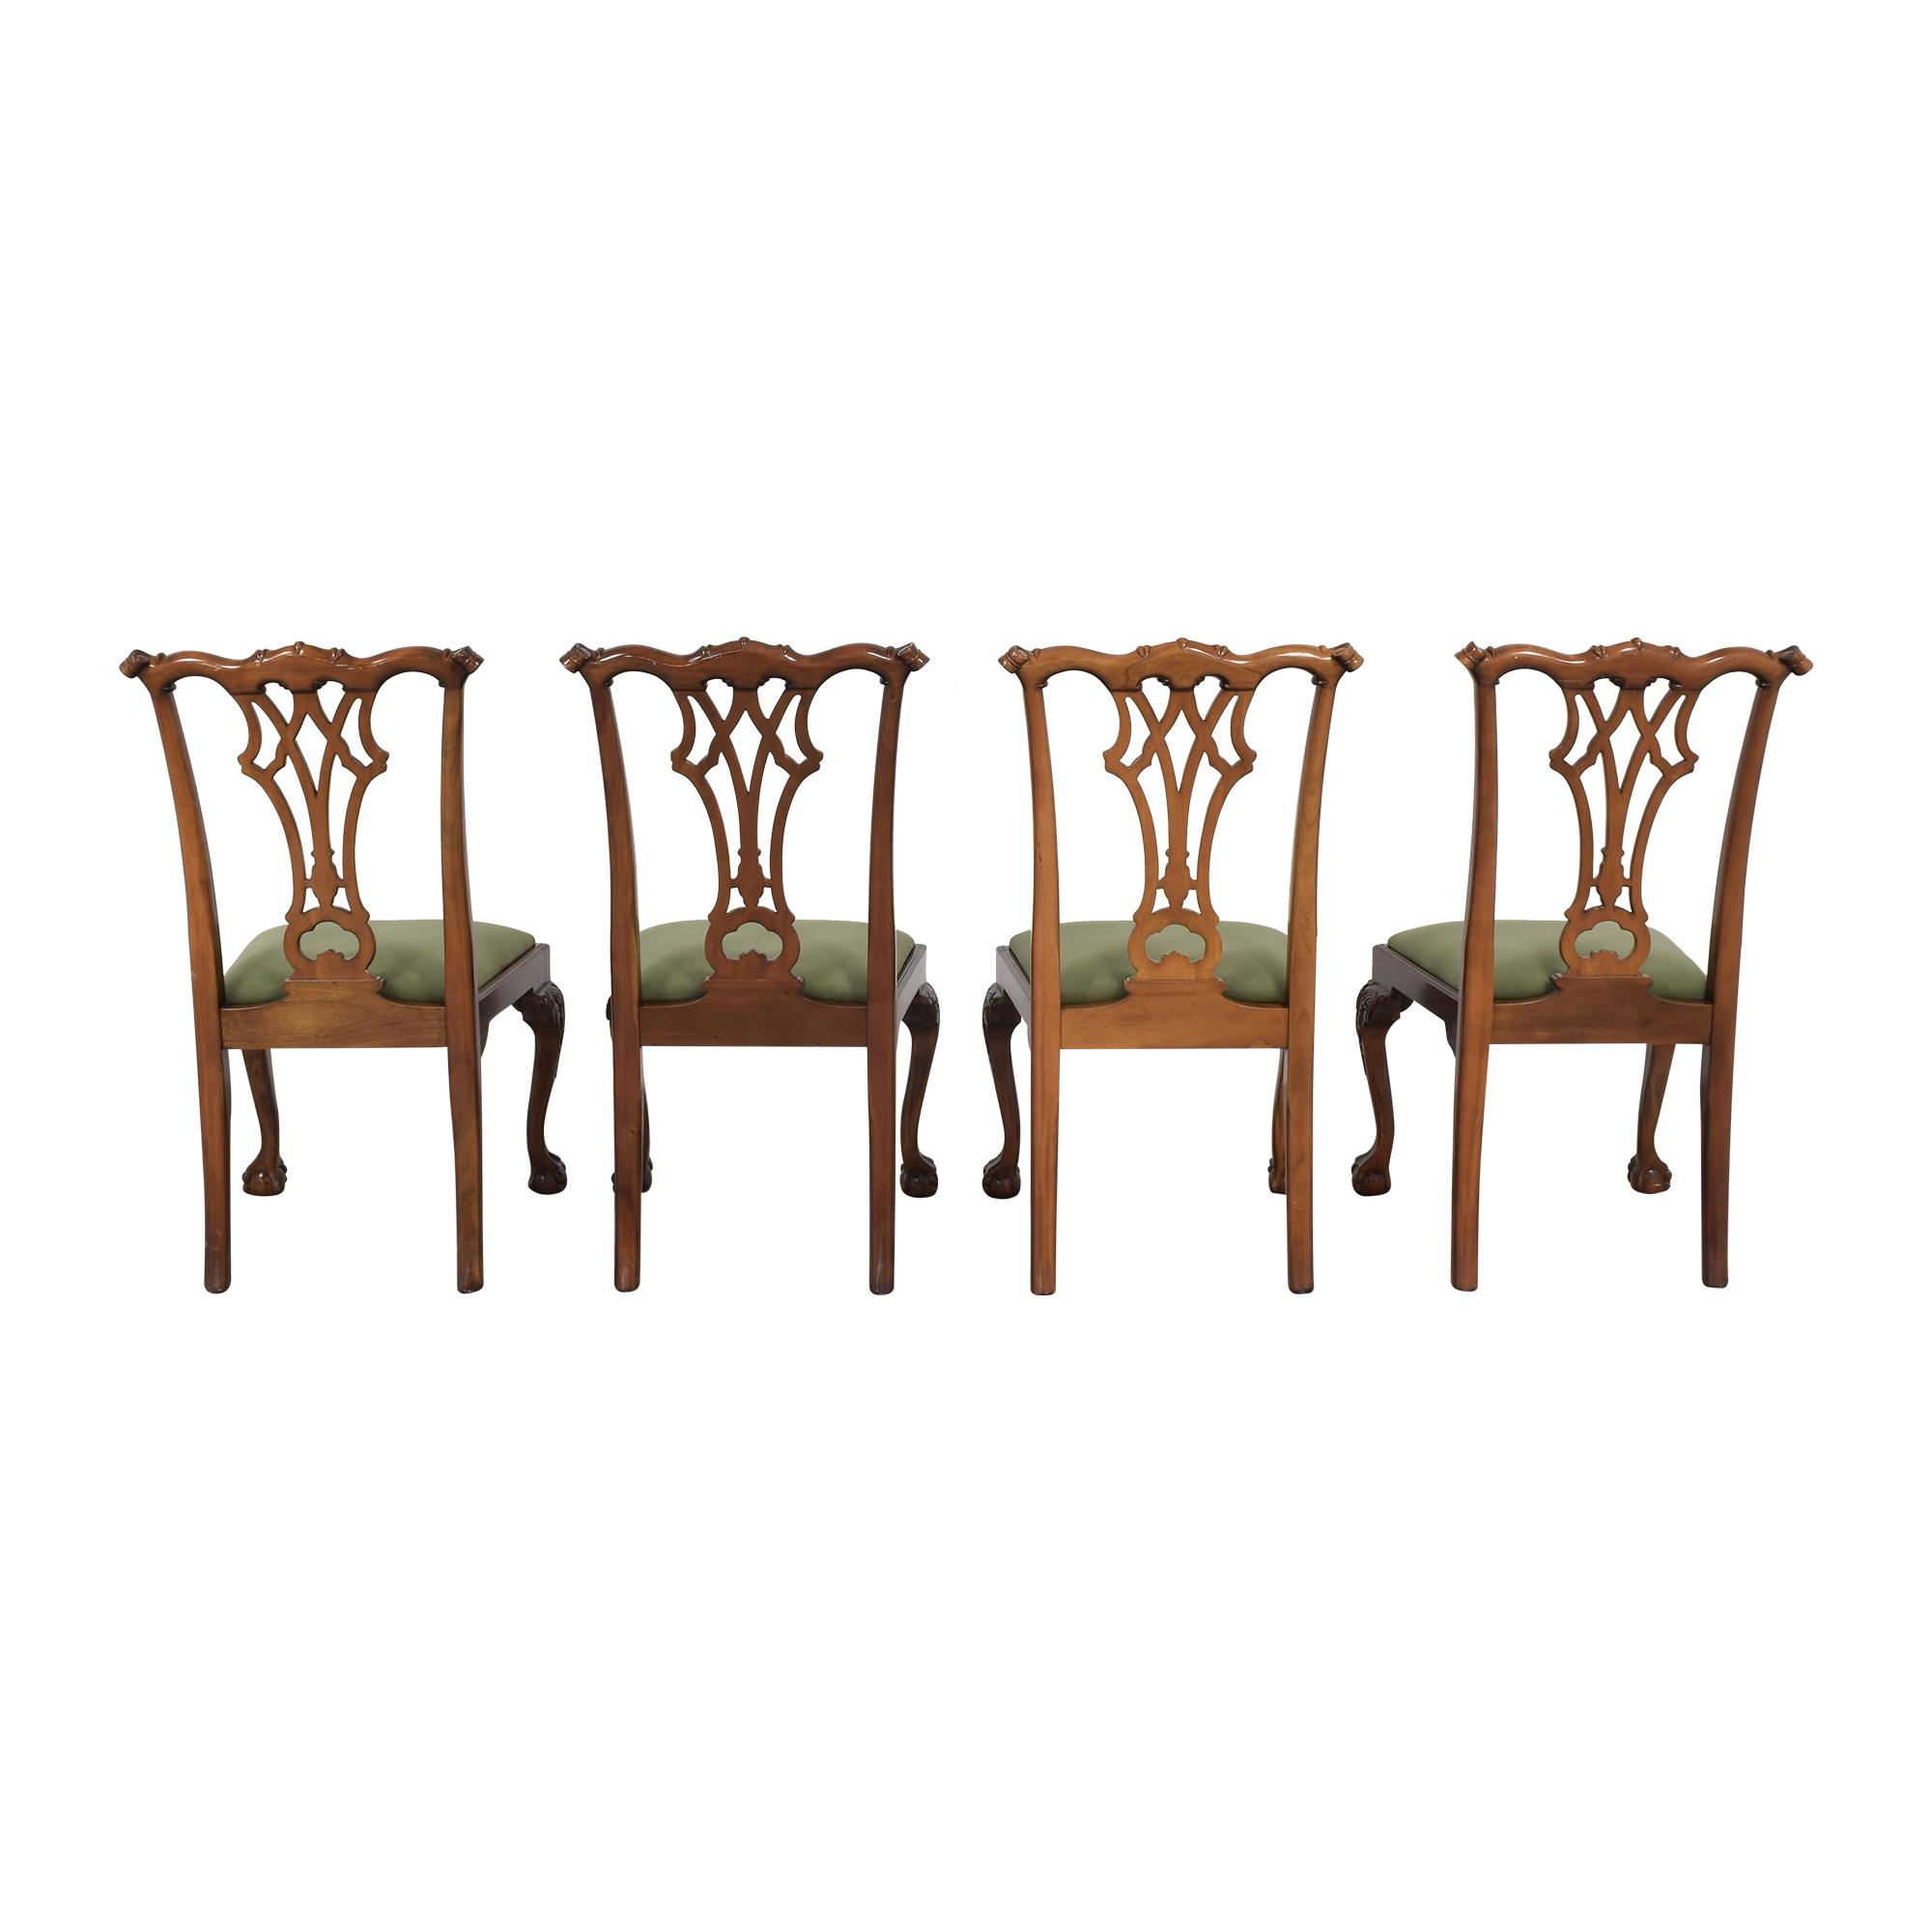 shop Greenbaum Interiors Vintage Upholstered Dining Chairs Greenbaum Interiors Dining Chairs